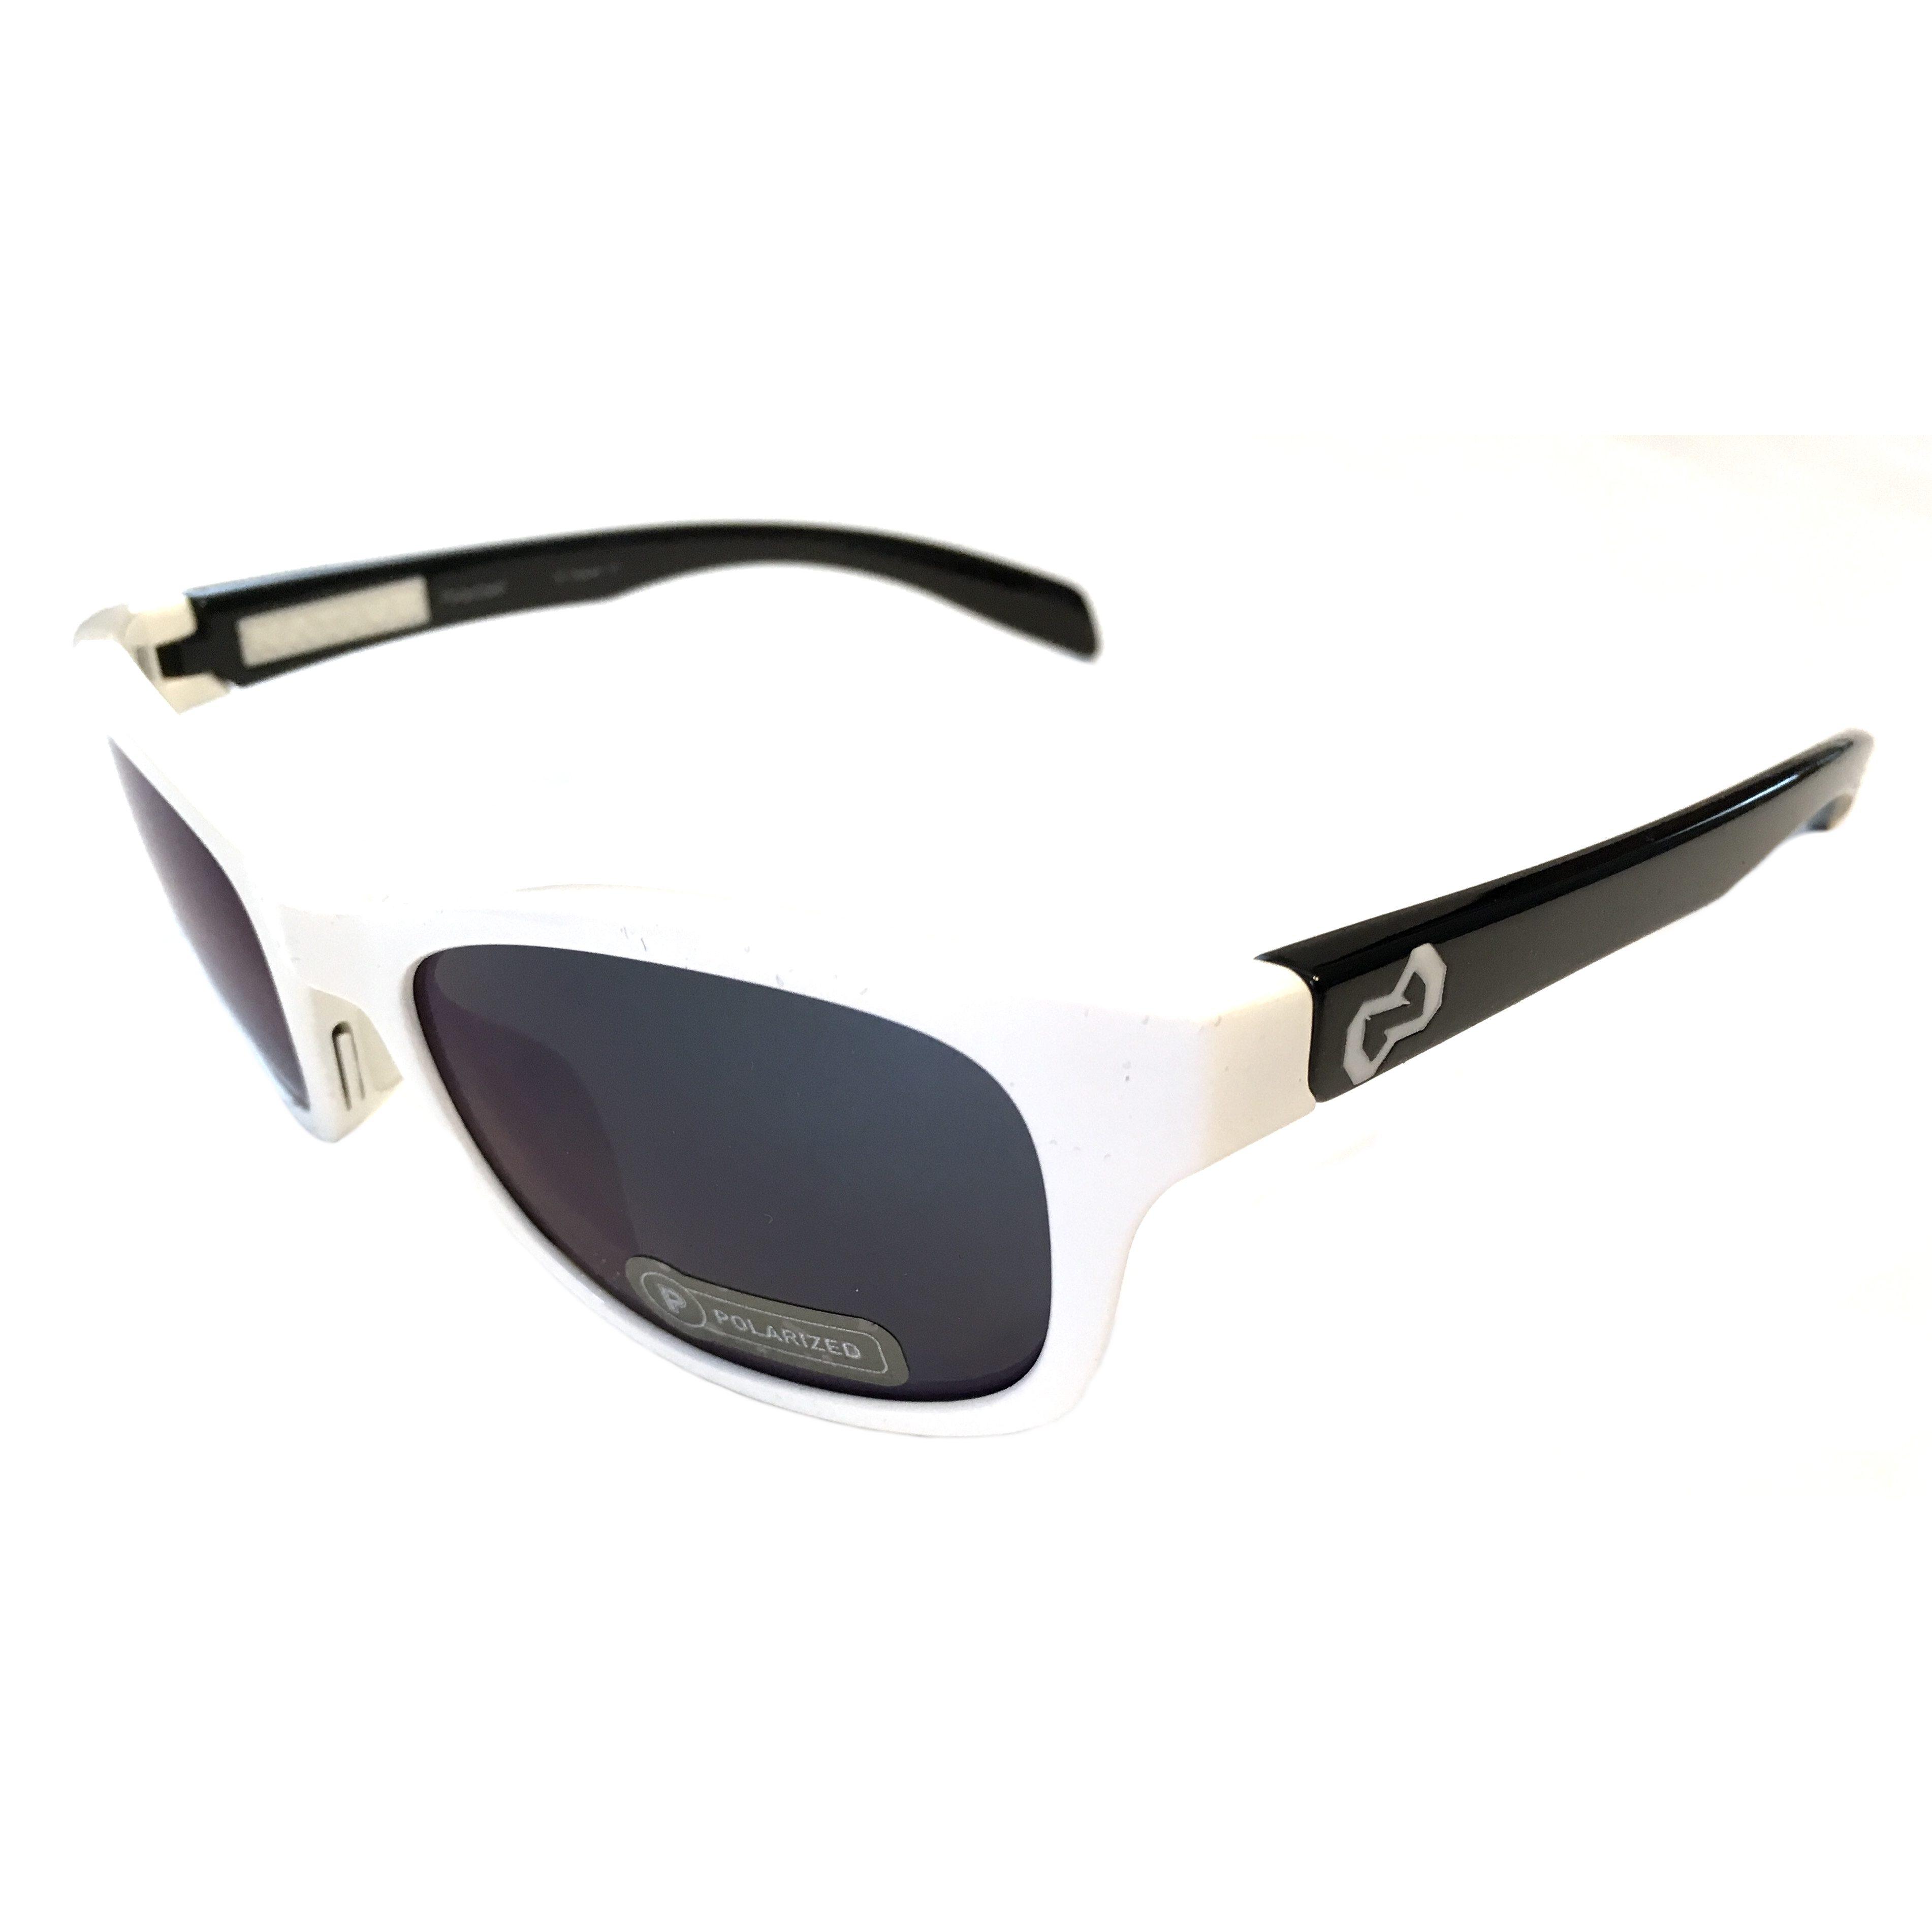 aed00c1d22 Native Eyewear Highline - Snow White   Black - POLARIZED N3 Blue Reflex